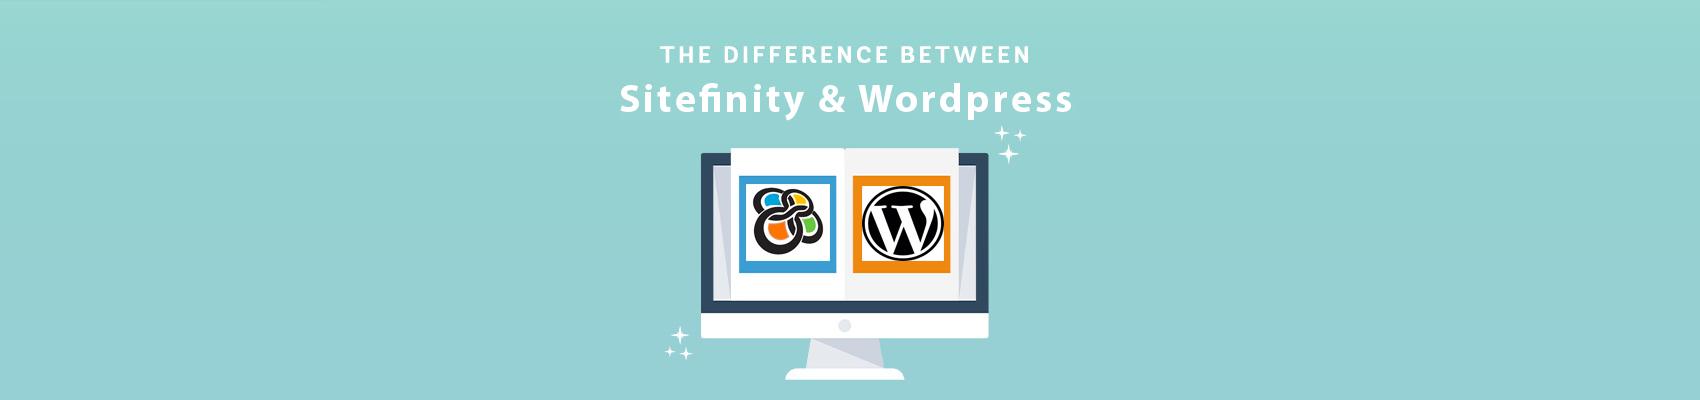 Sitefinity vs. Wordpress